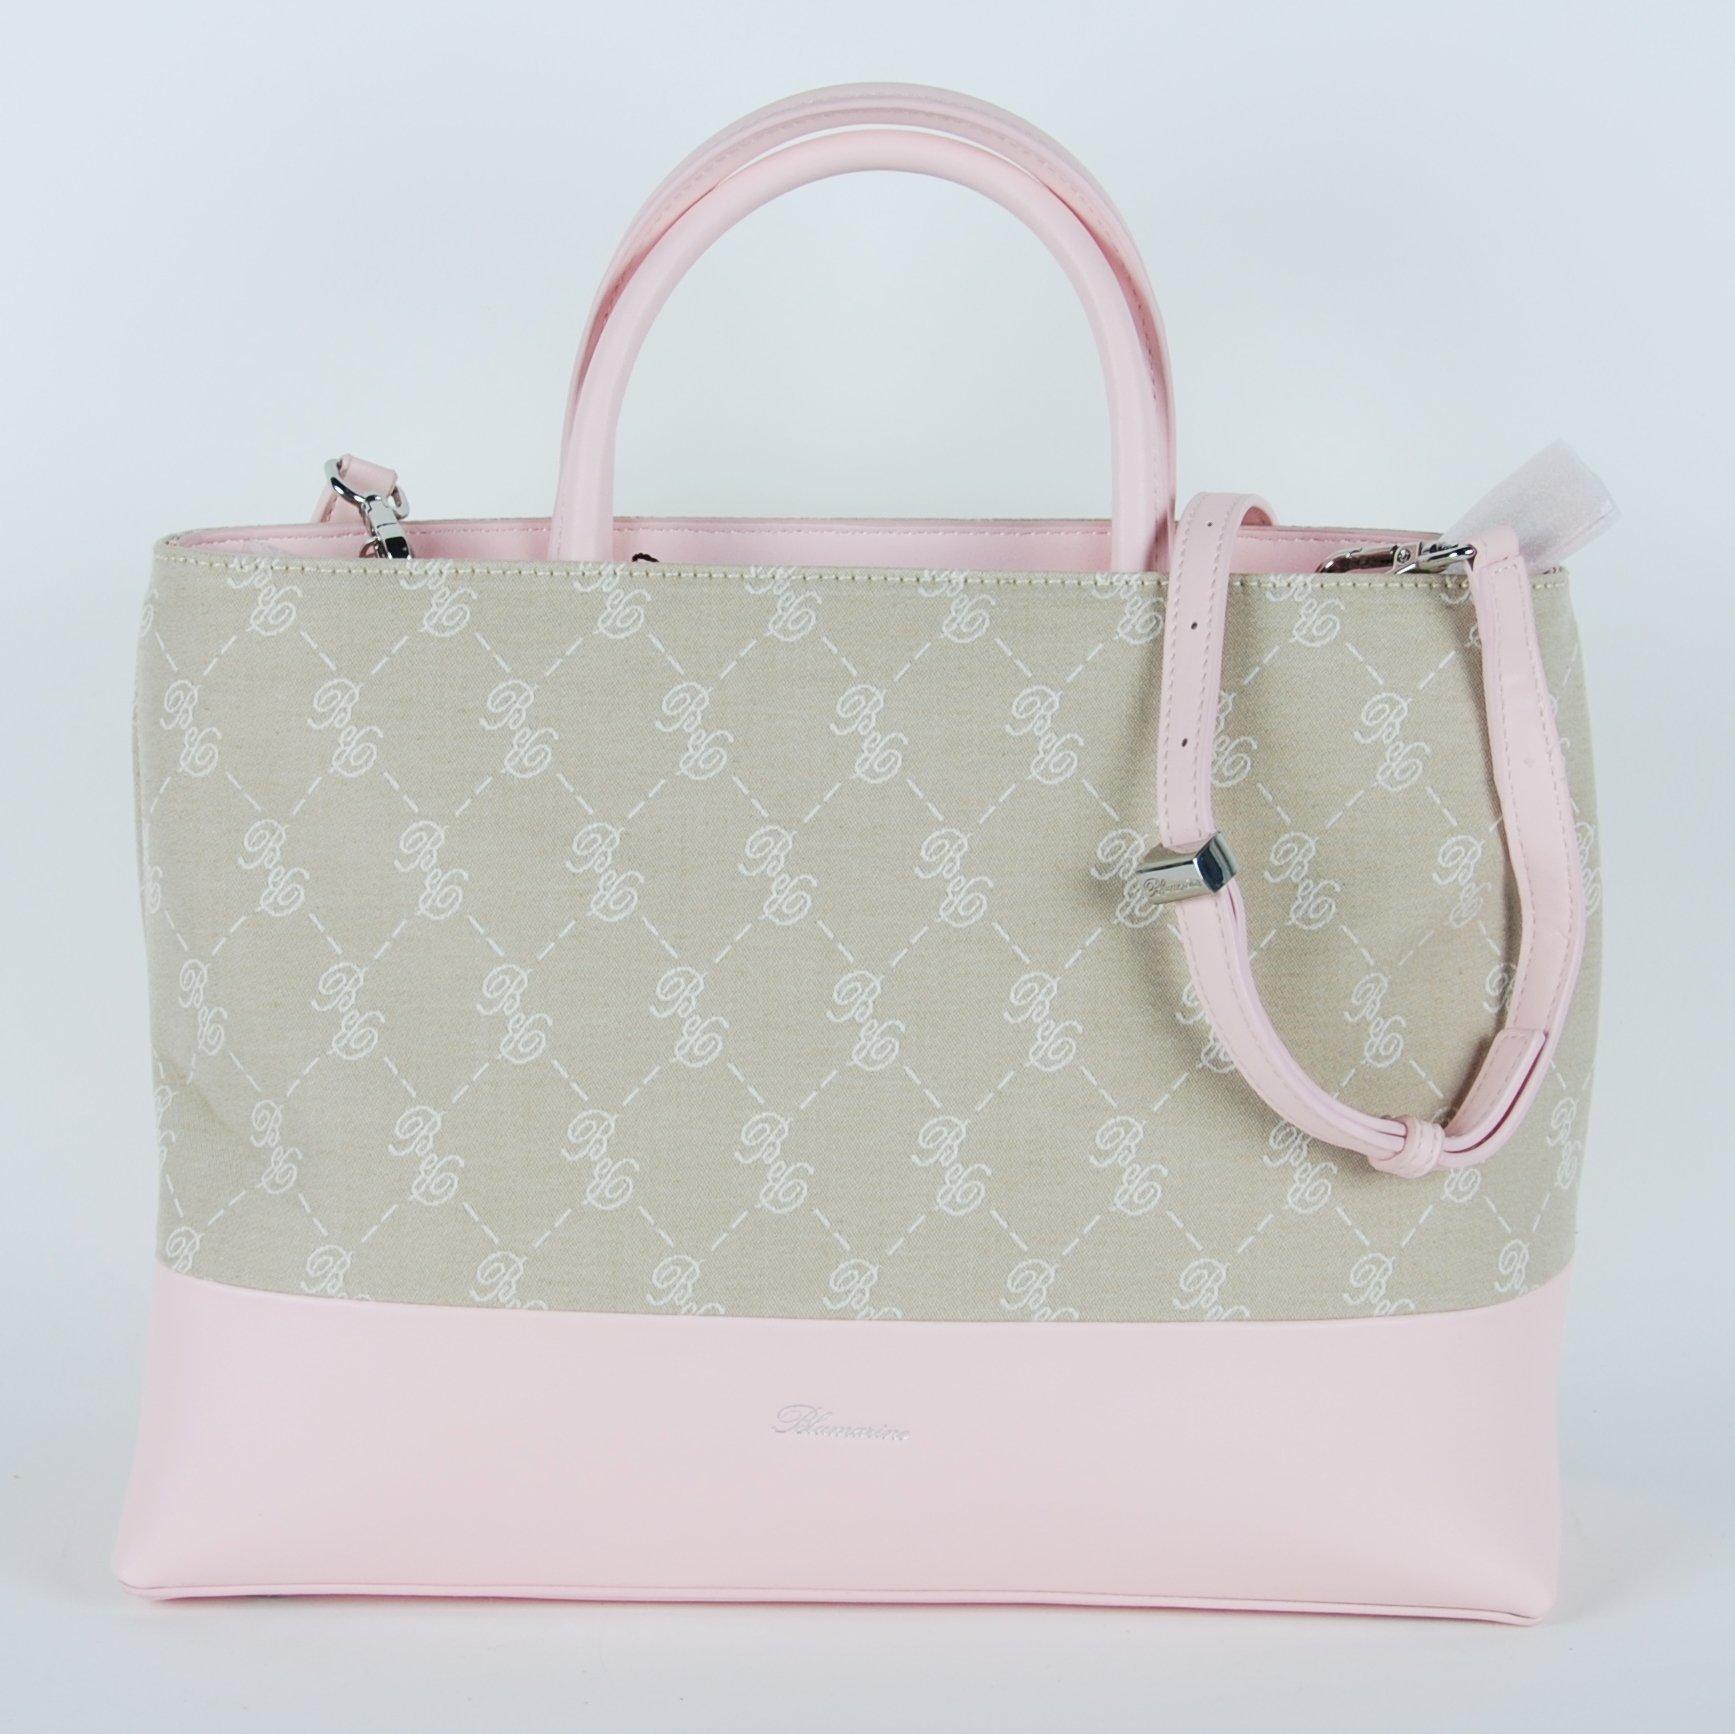 Blumarine Women's Handbag Pink BL1421501